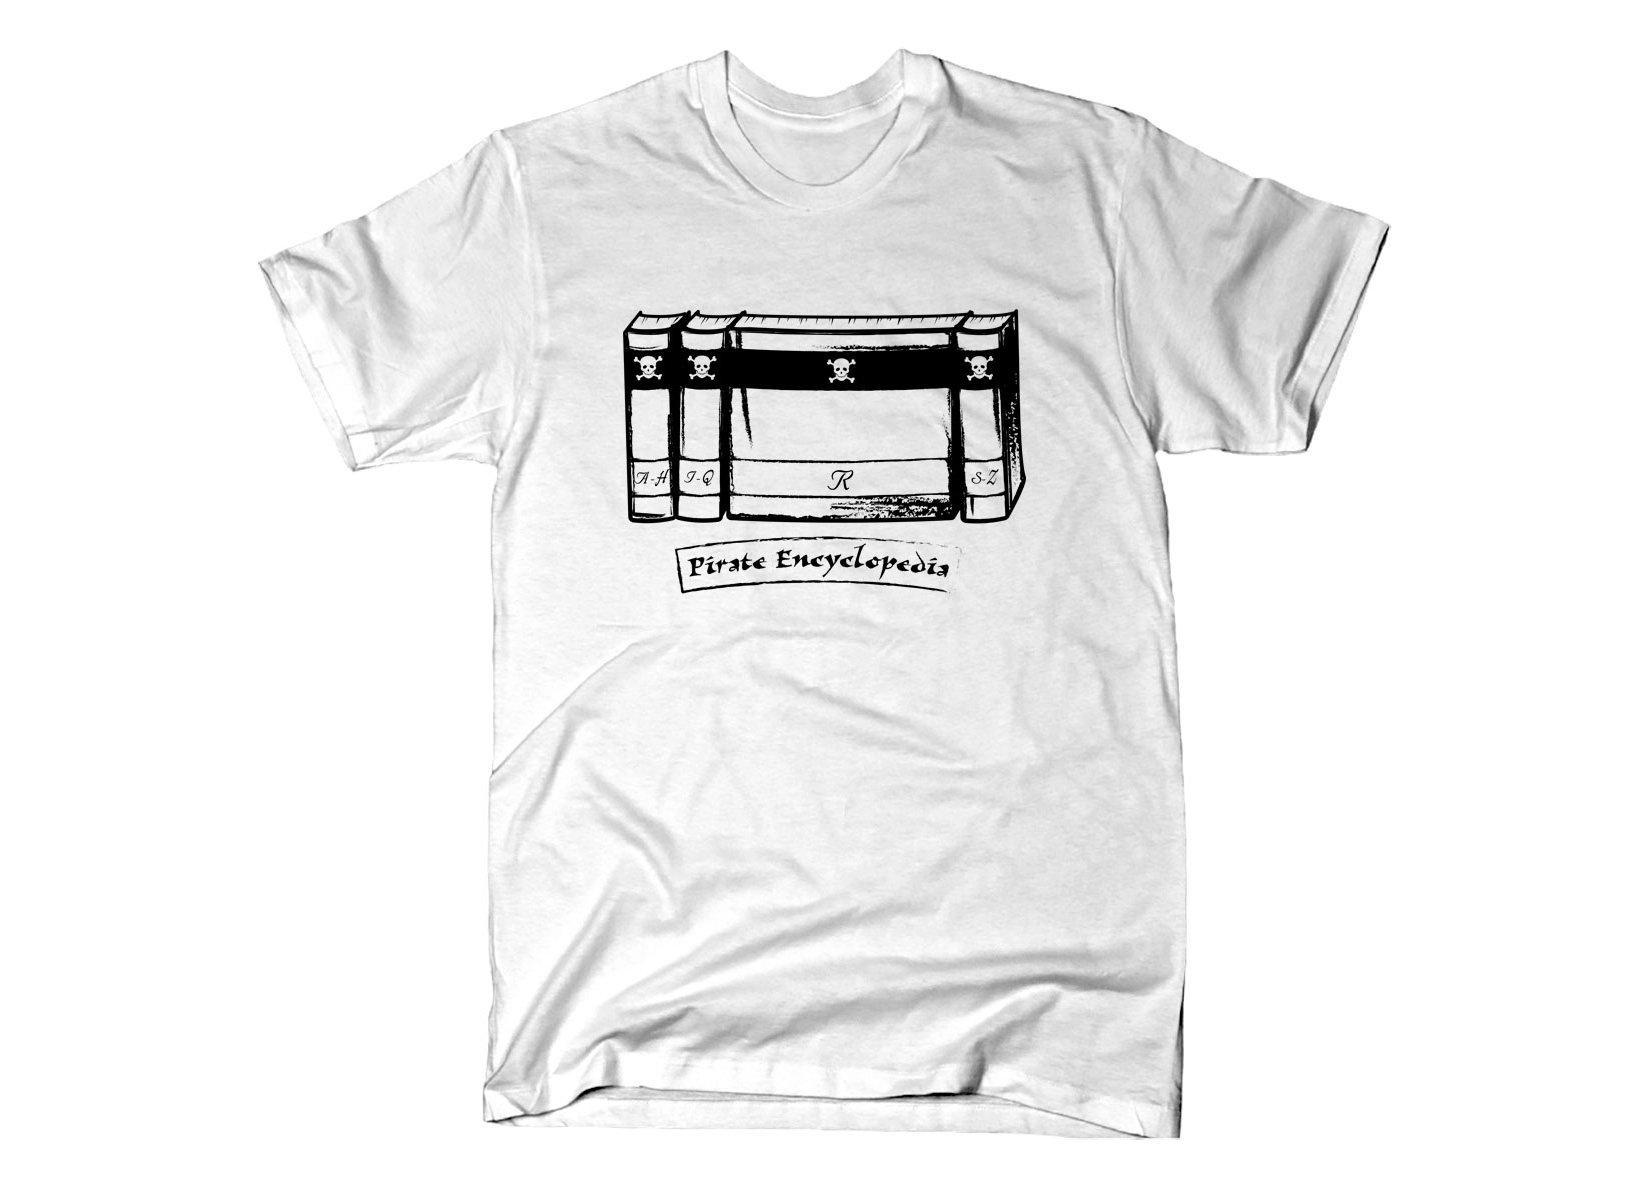 Pirate Encyclopedia on Mens T-Shirt